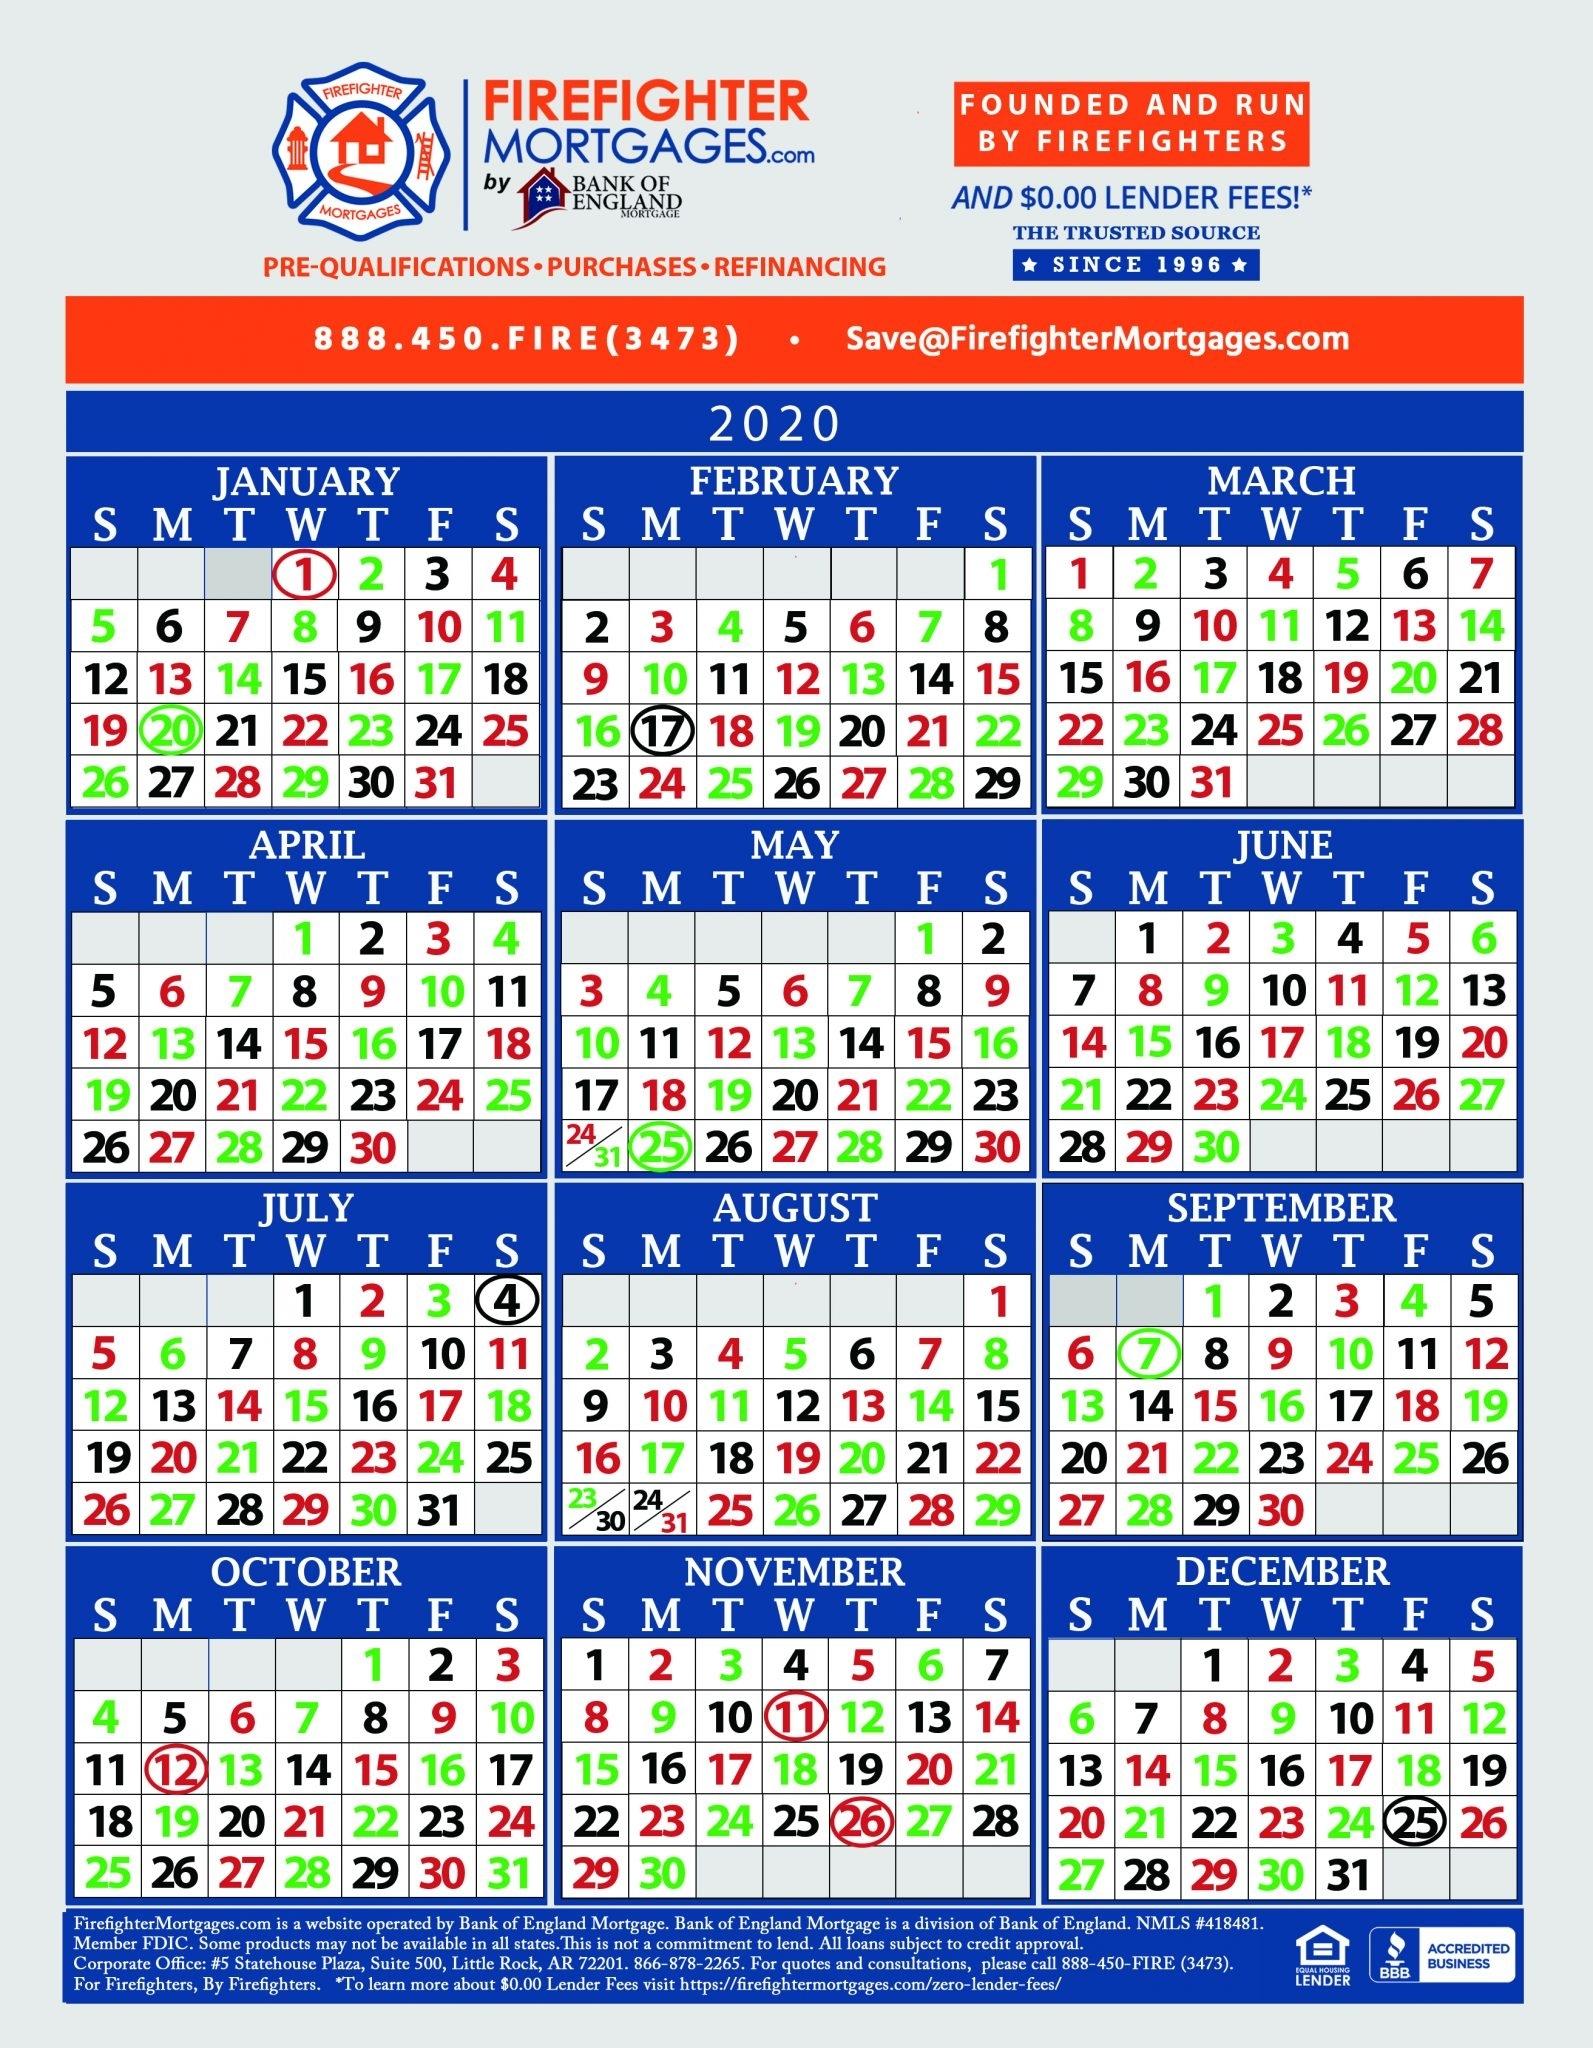 Firefighter Shift Calendars - Firefighter Mortgages®